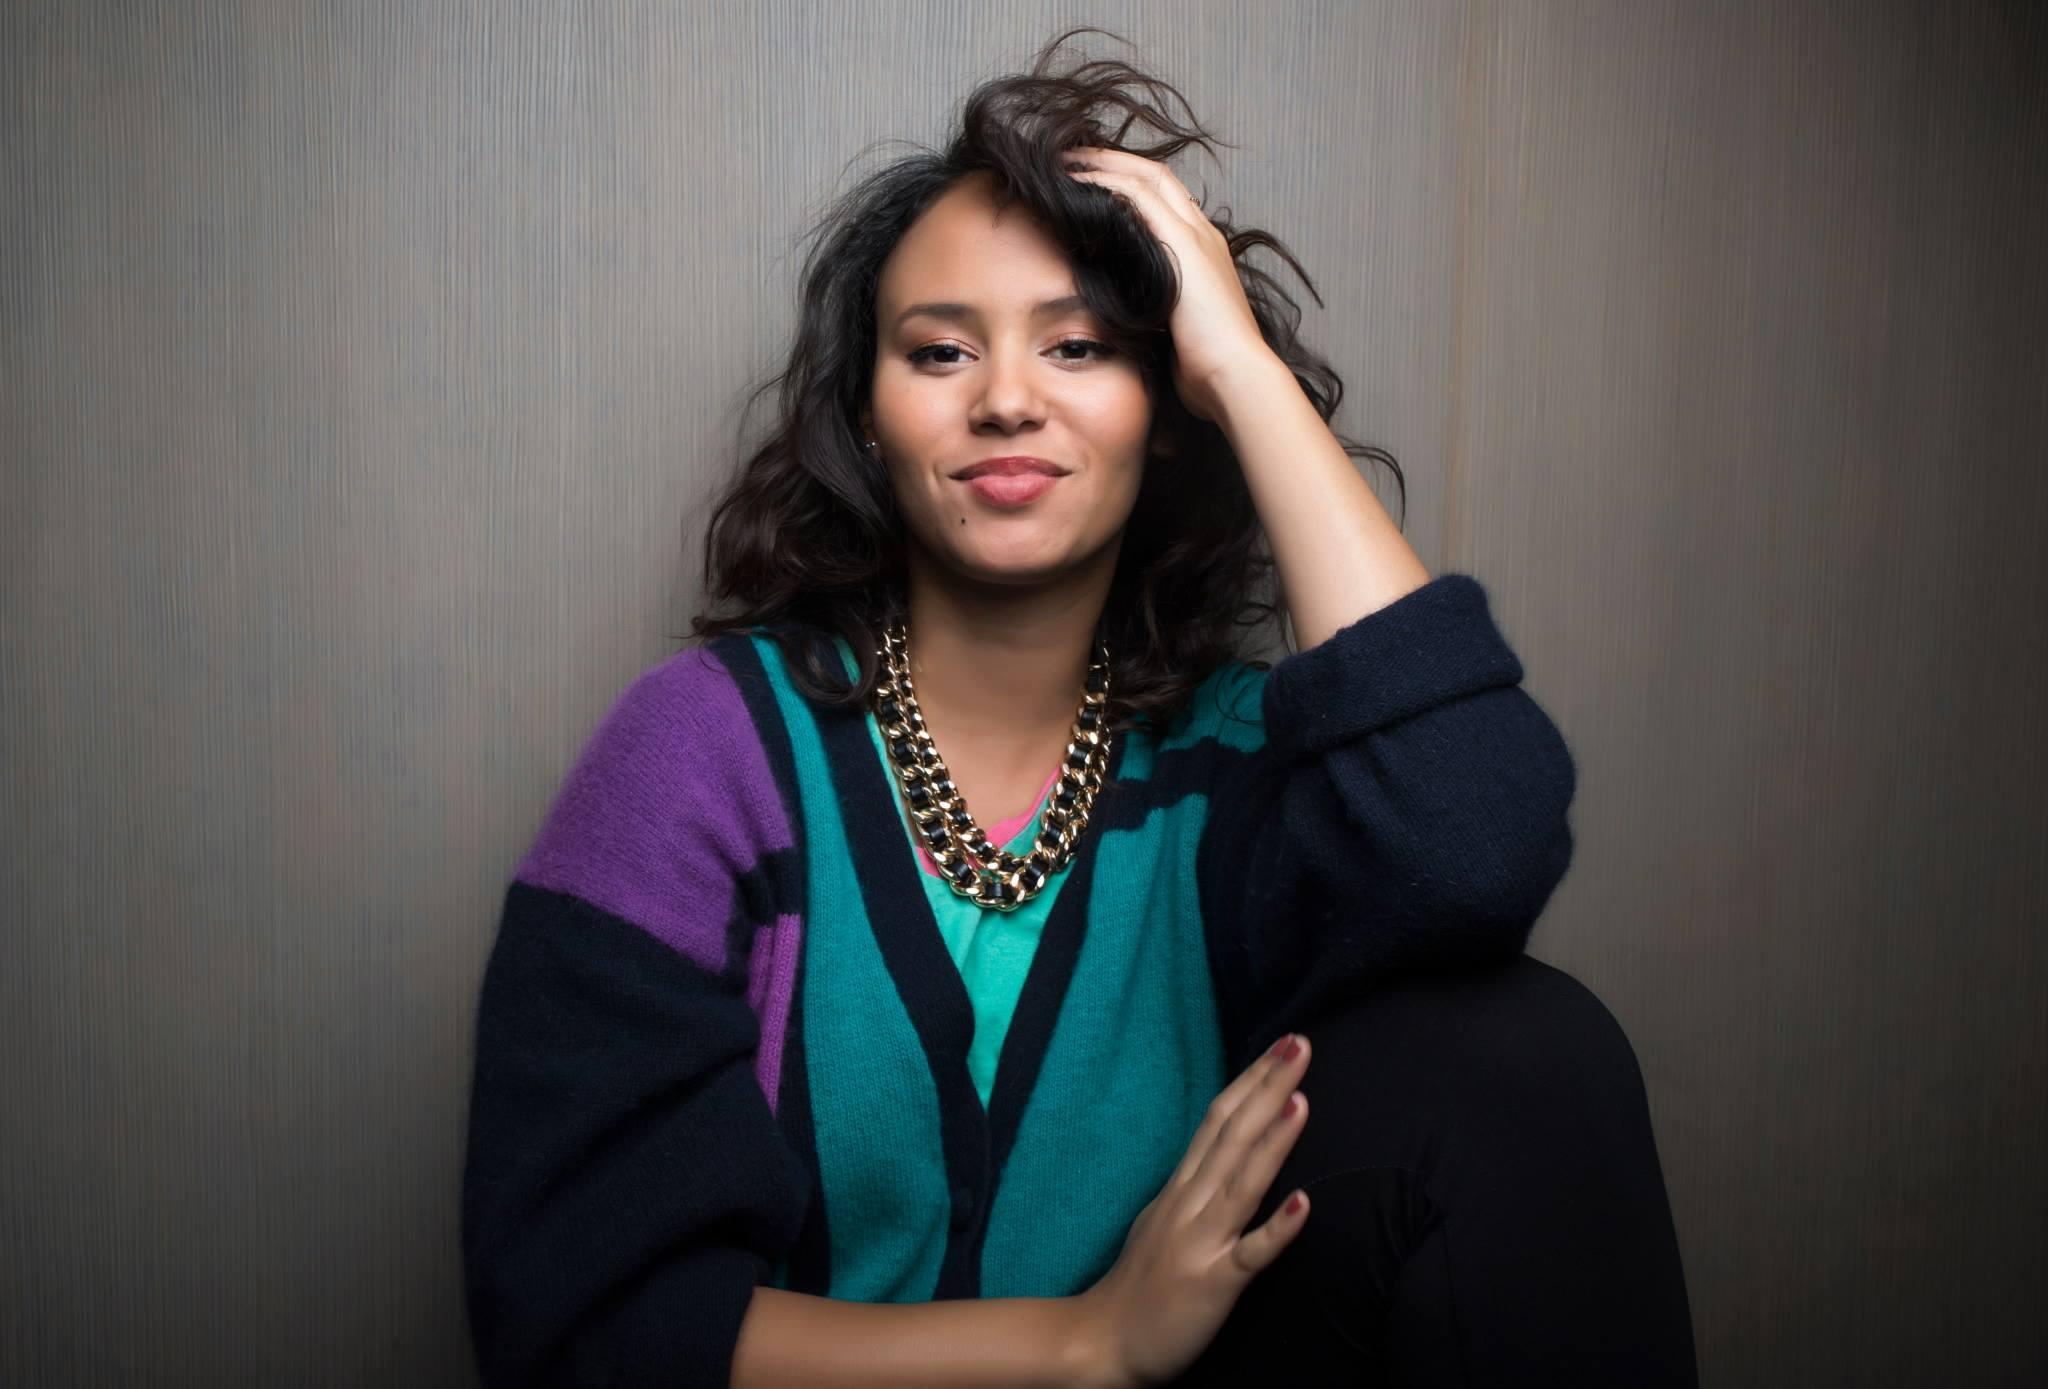 Mayra, Sade, Sola dans la playlist n°1 d'FLV